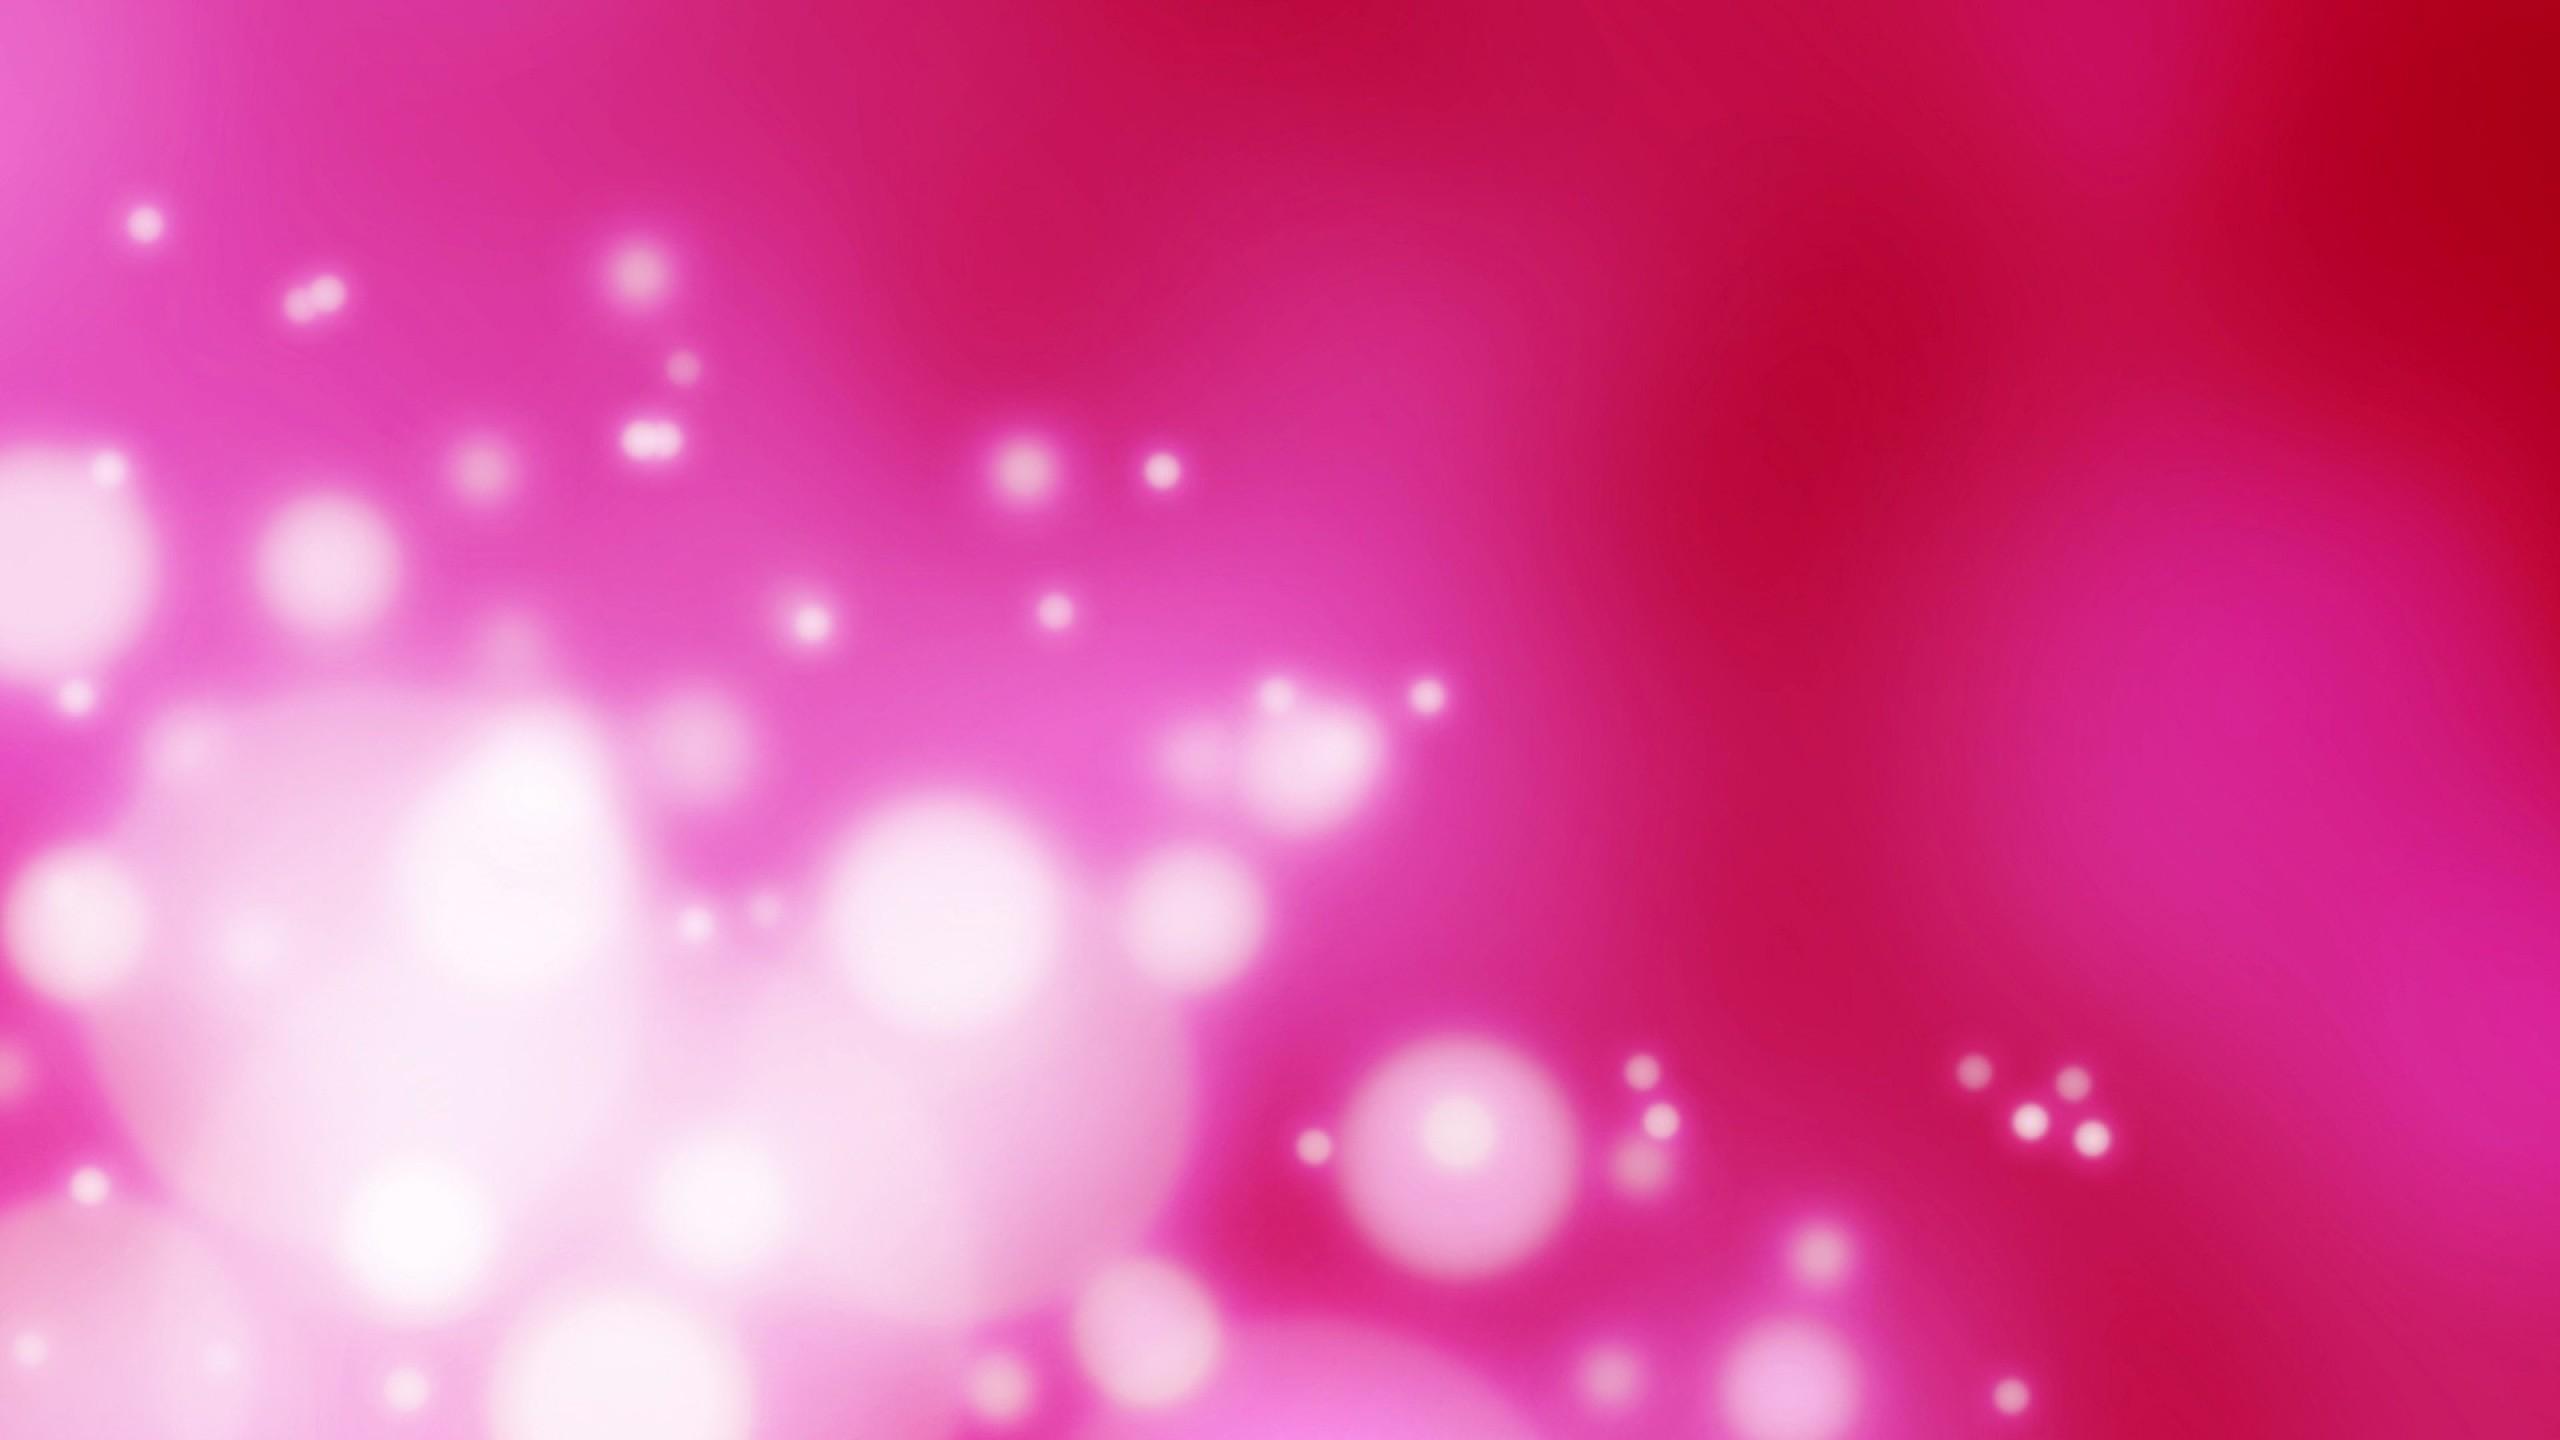 Download Pink Glitter Wallpaper HD.